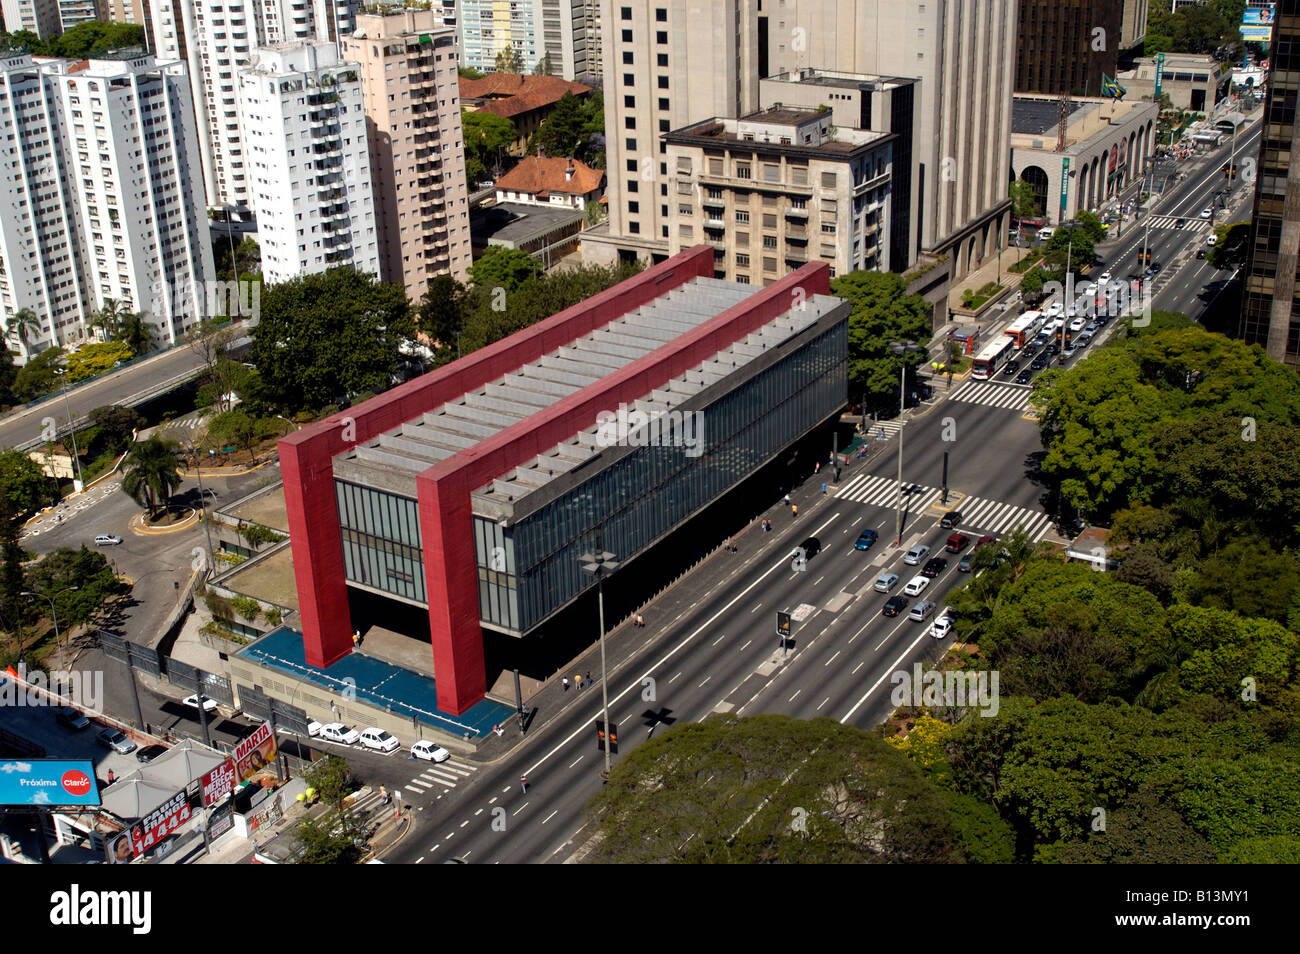 Sao Paulo S Art Museum Masp Located At Paulista Avenue Sao Paulo Brazil